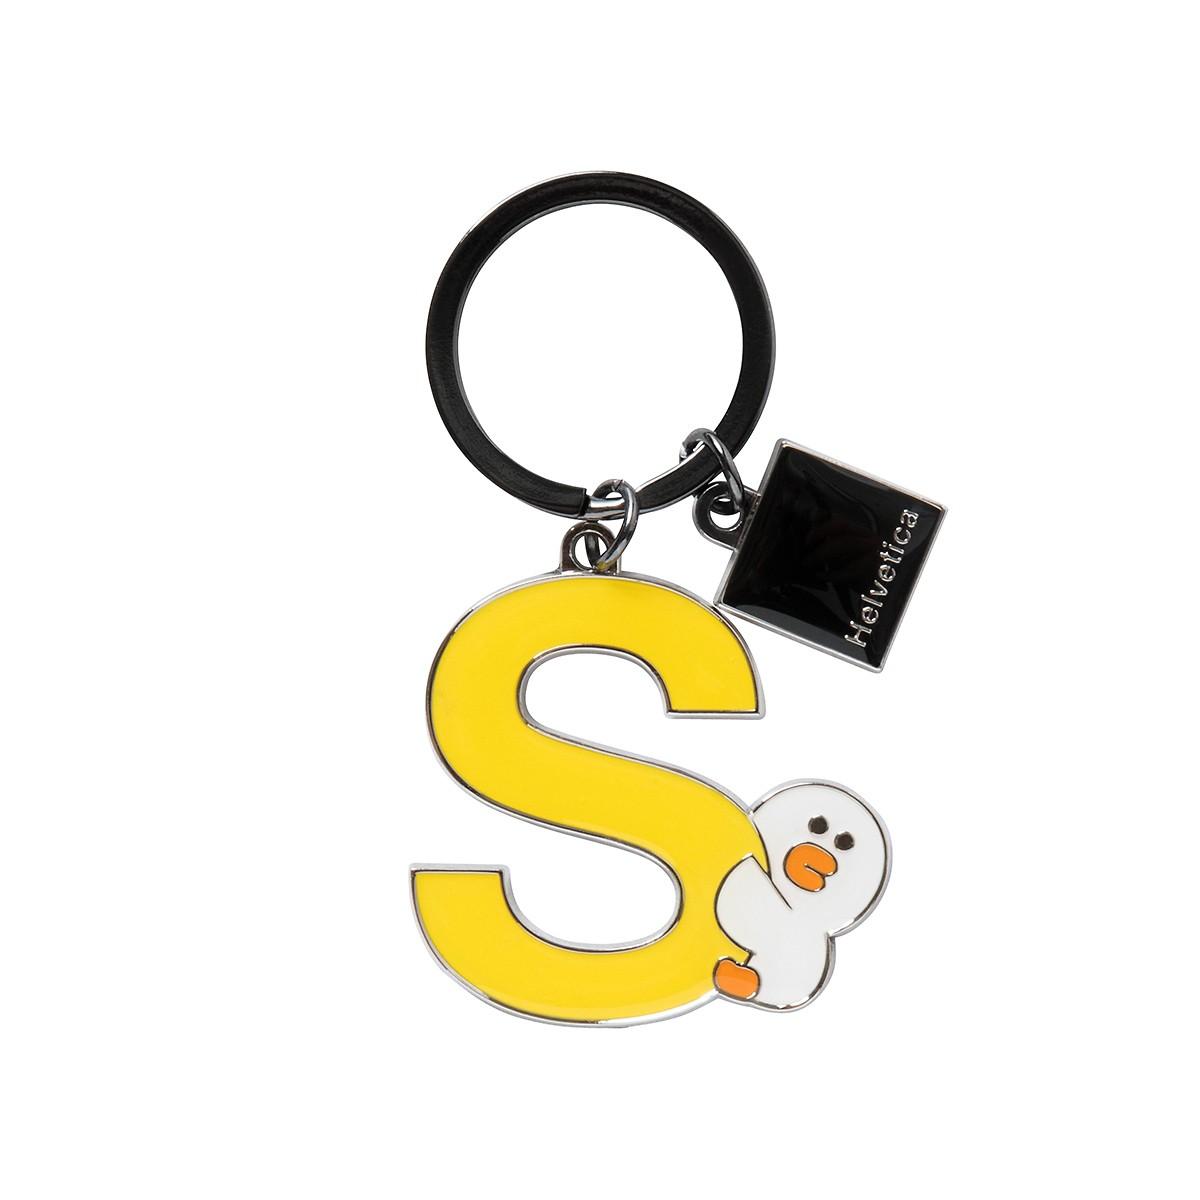 SALLY HELVETICA金属钥匙链